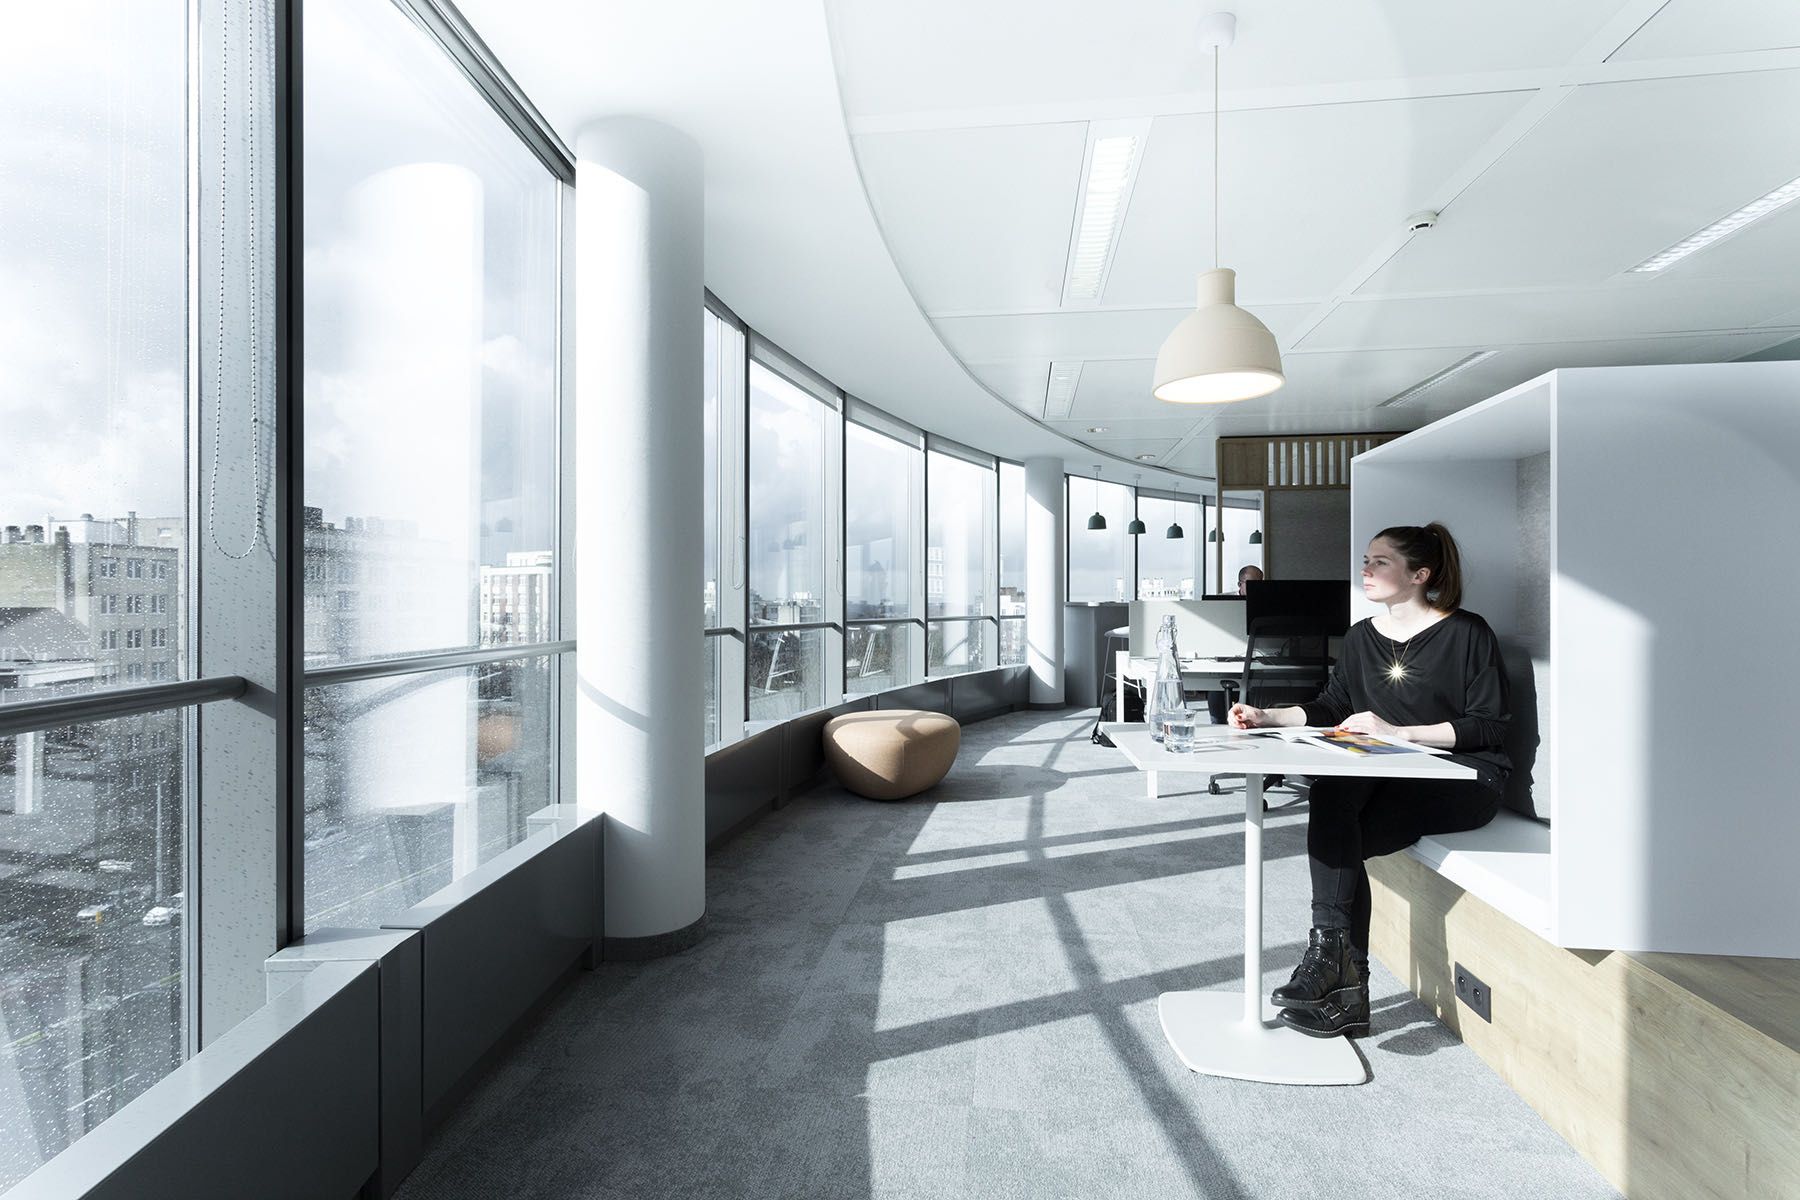 cefora-brussels-office-11